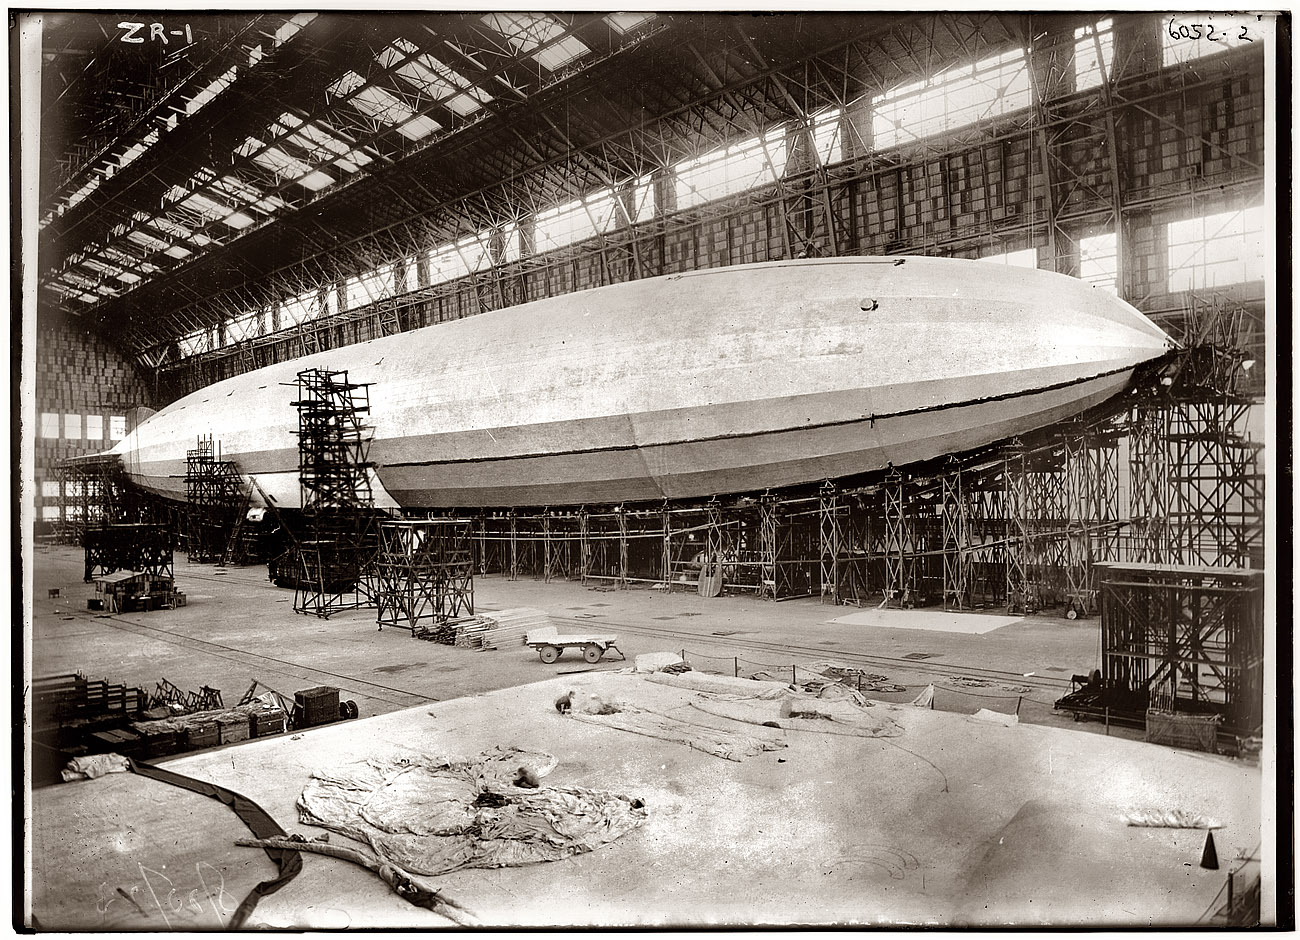 airship_desktop_1300x940_wallpaper-361940